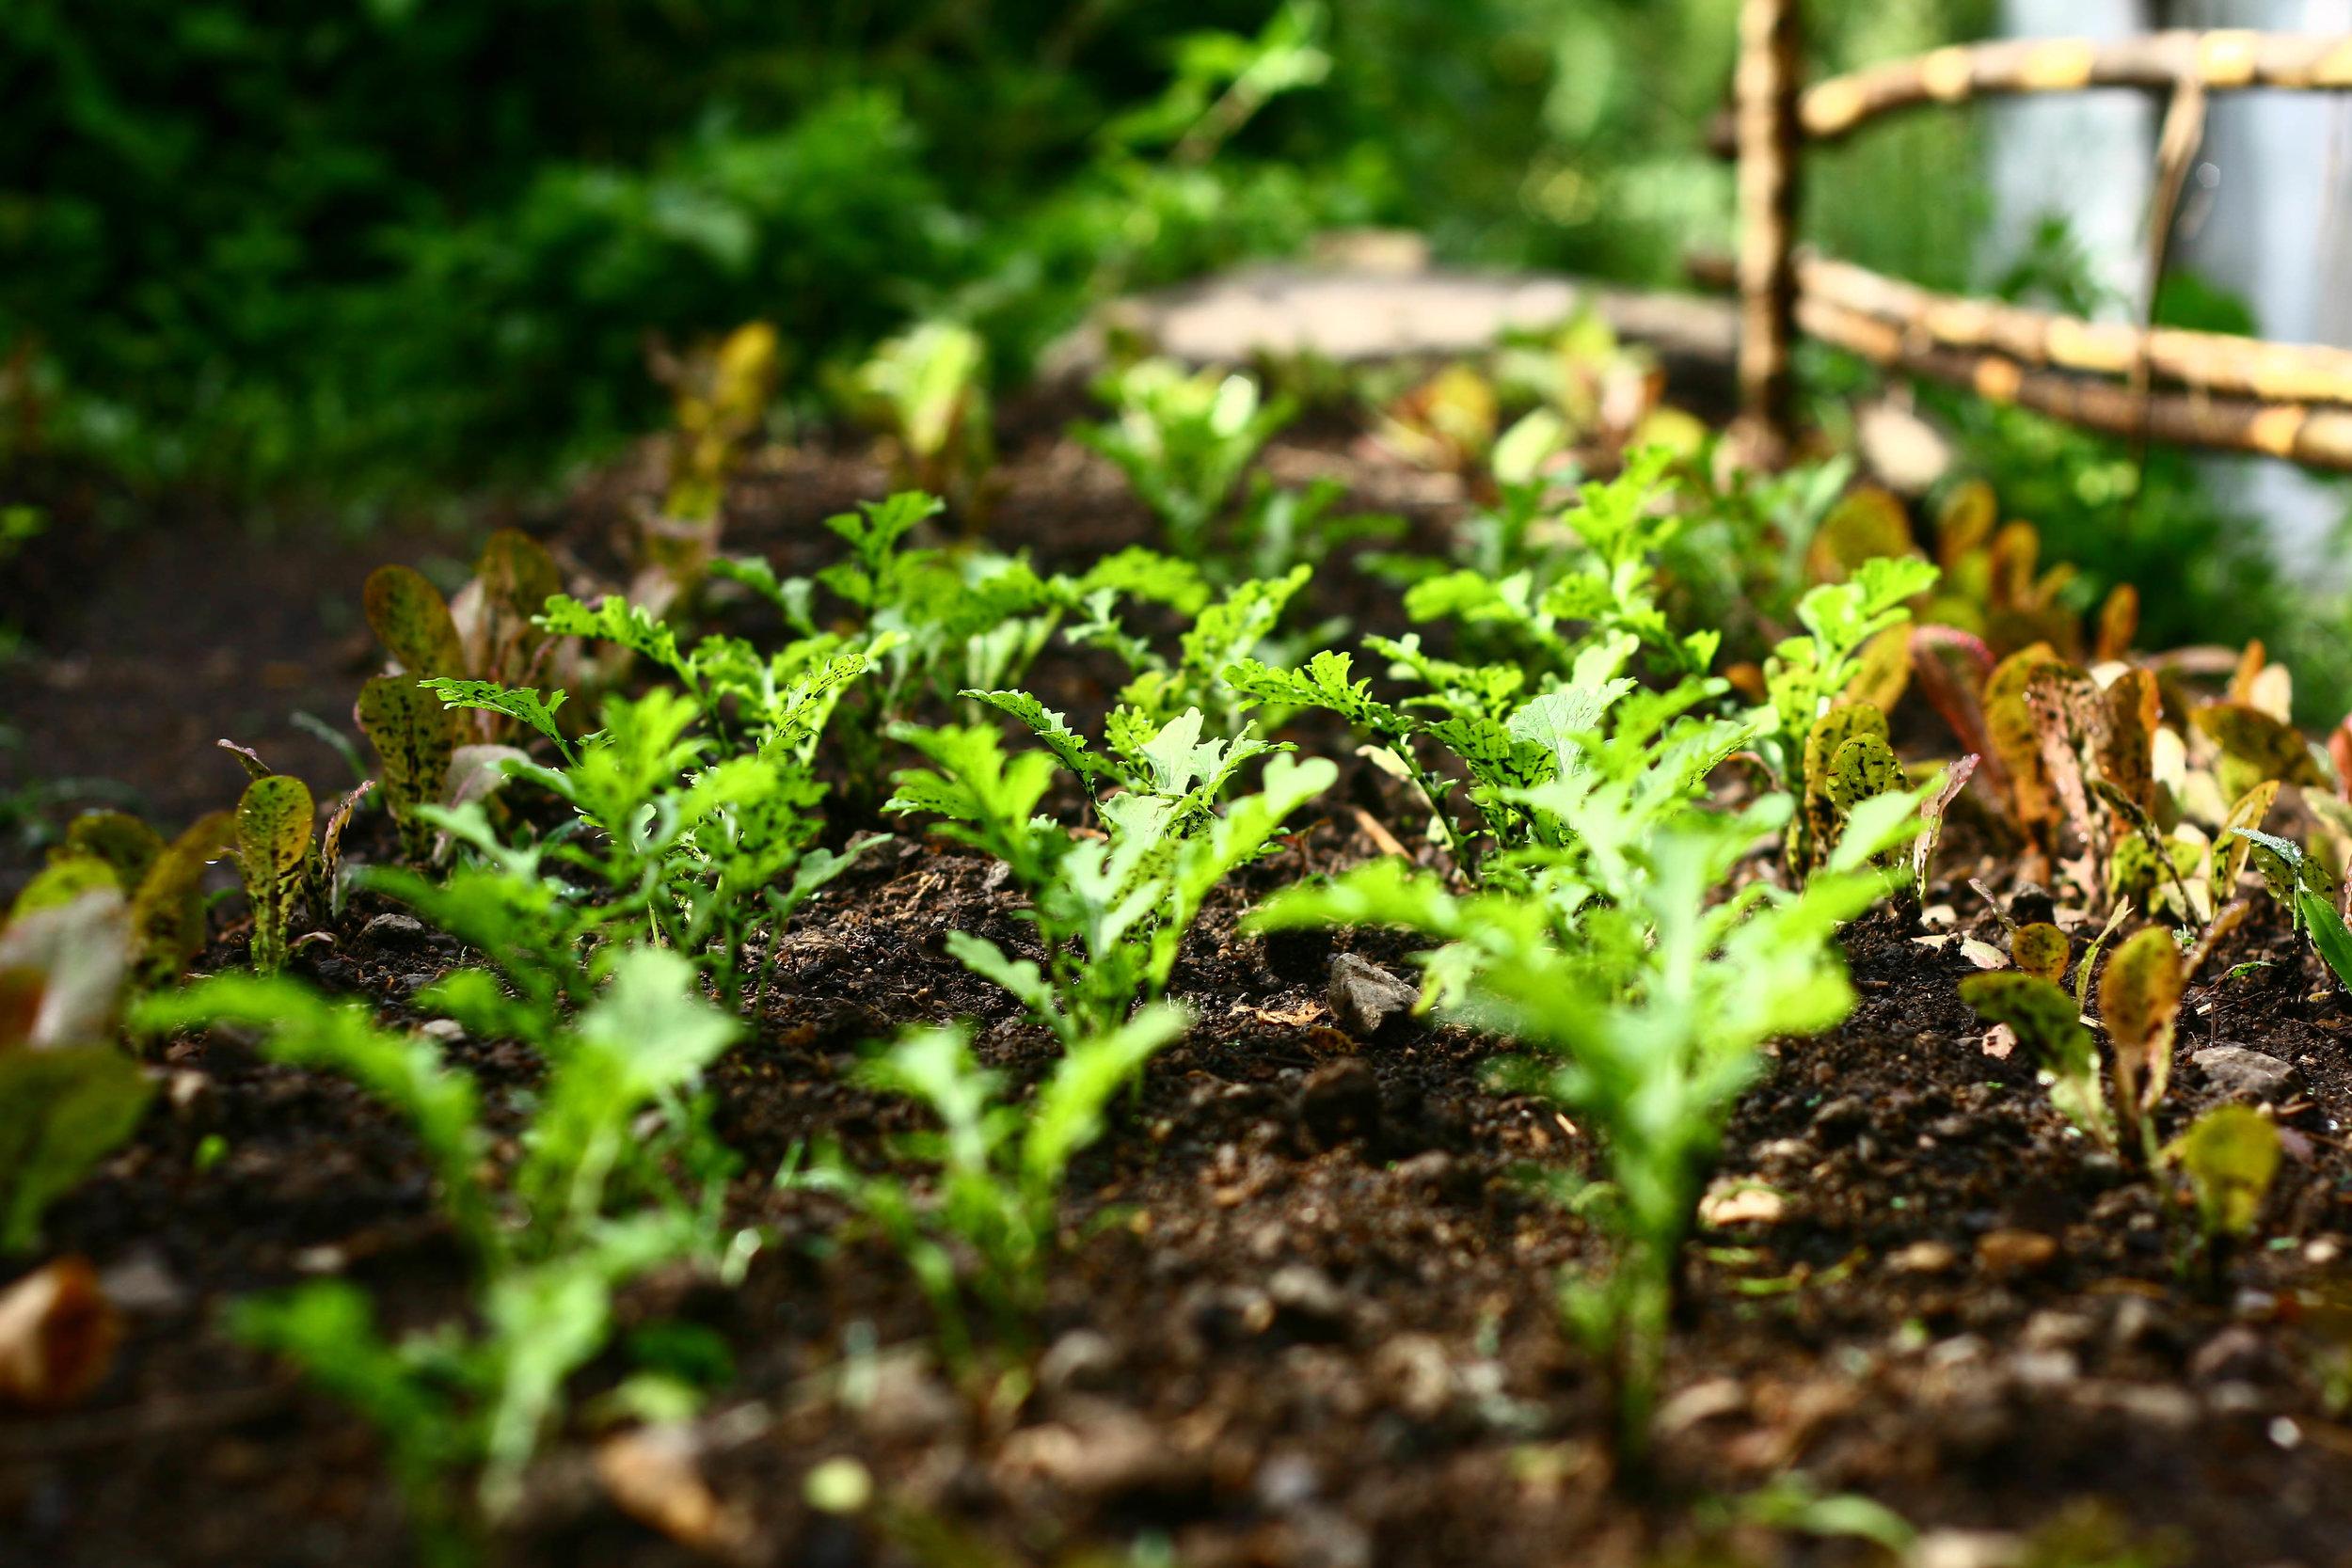 Atitlan Organics Permaculture Farm, Permaculture, Tzununa, Lake Atitlan, Guatemala, Central America, Regenerative Agriculture, Organic